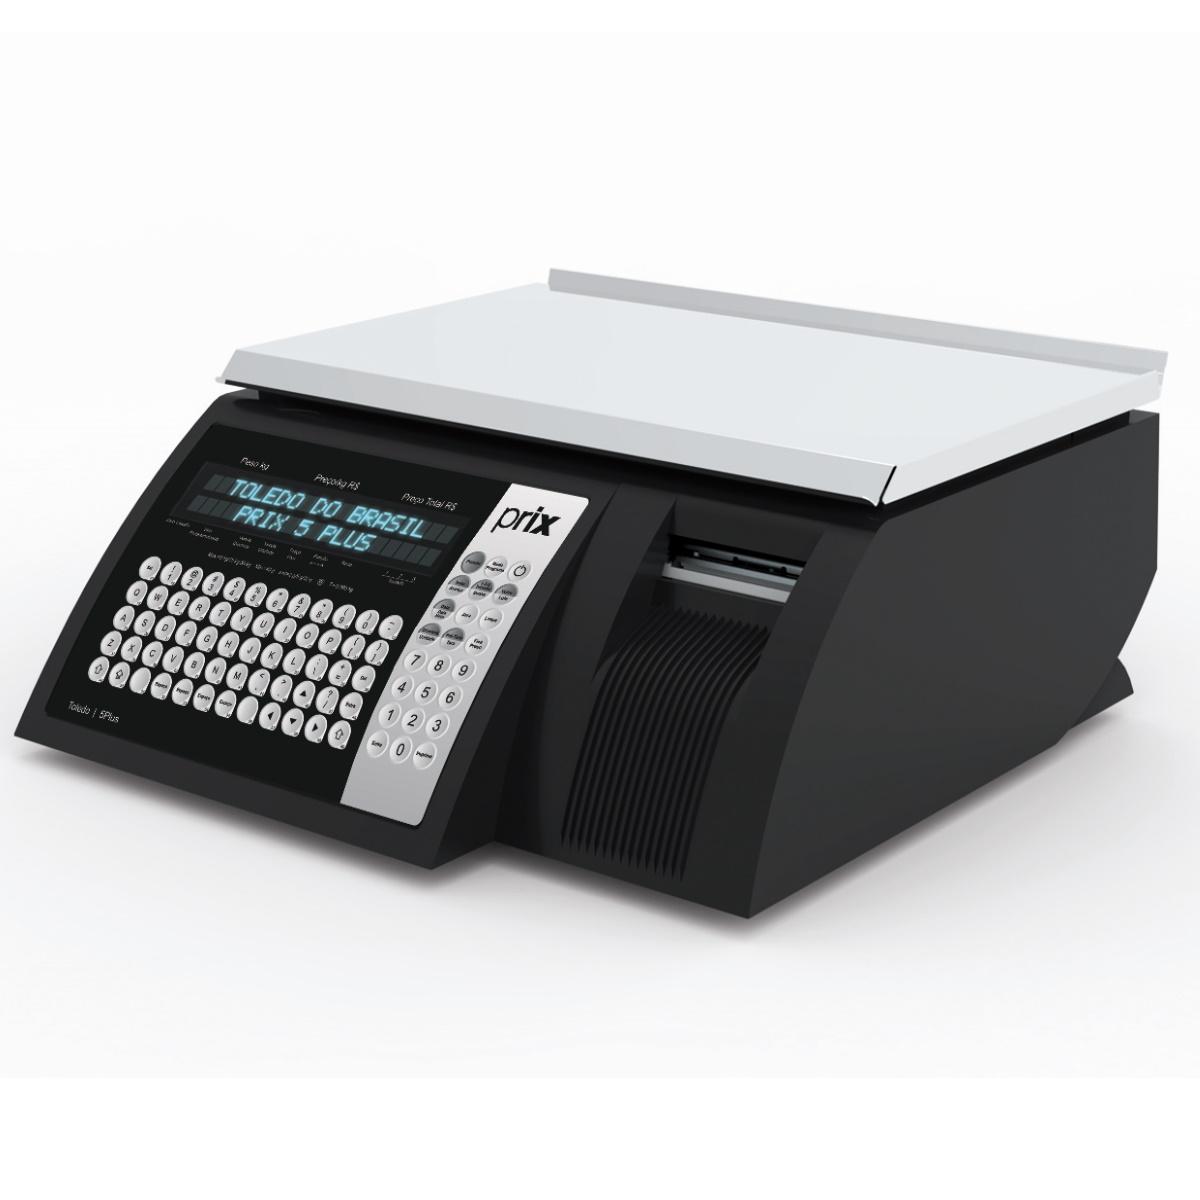 Balanca Eletronica Toledo Prix 5 Plus C/Impressor Wifi Preta